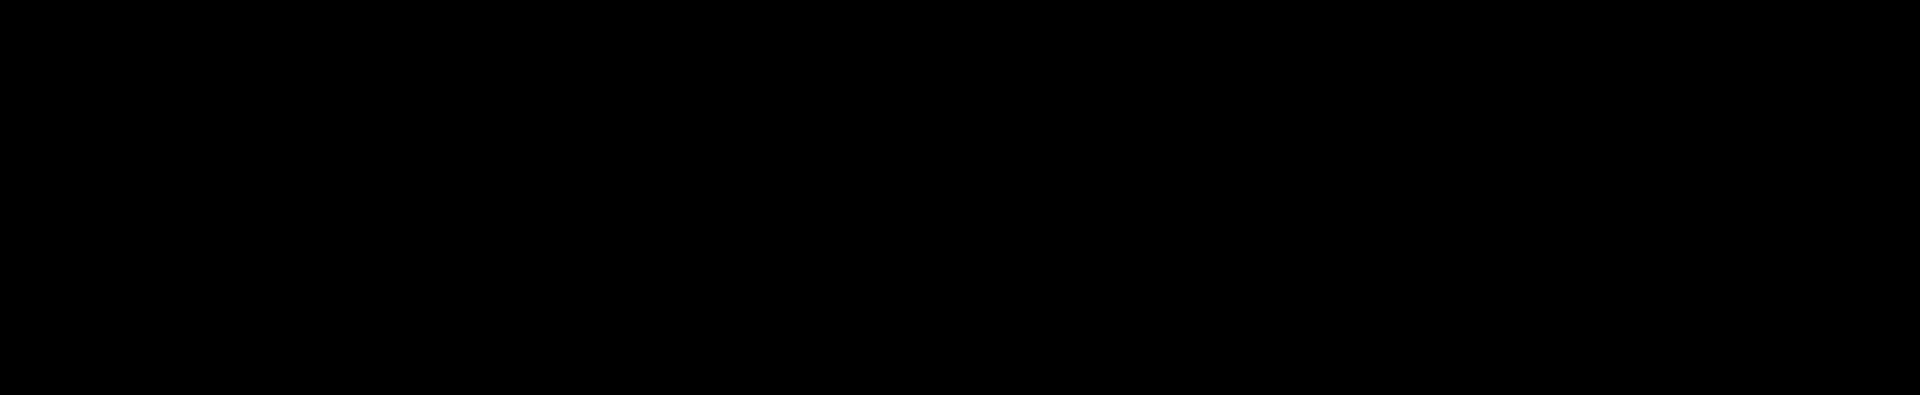 Sunlight logo nuevo